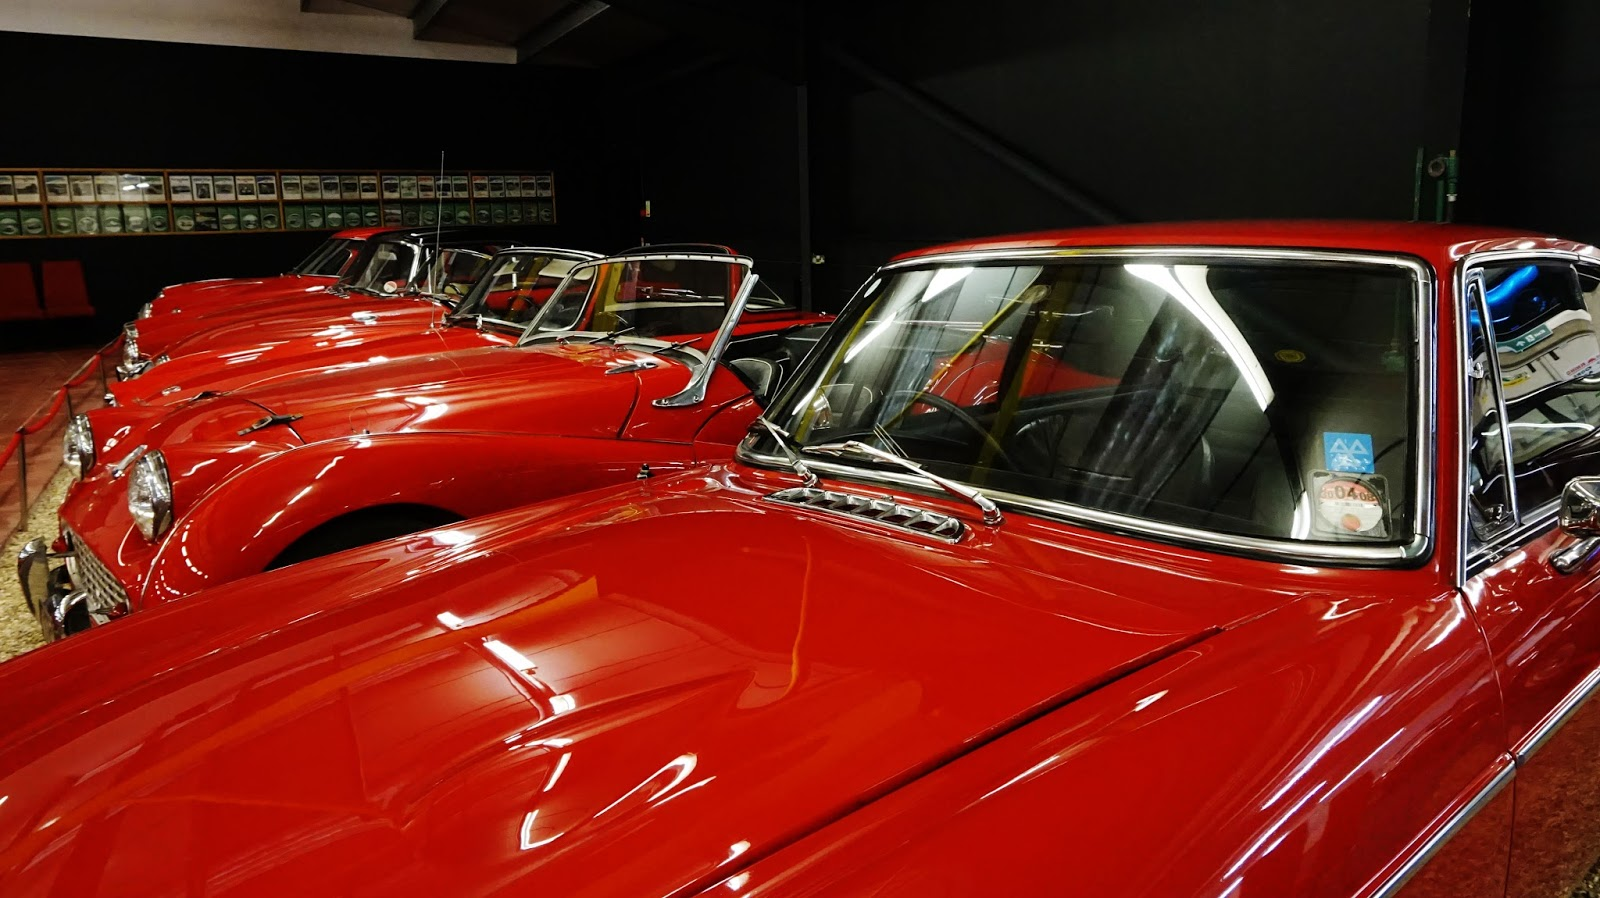 classic cars red room sports car nostalgic haynes motor museum